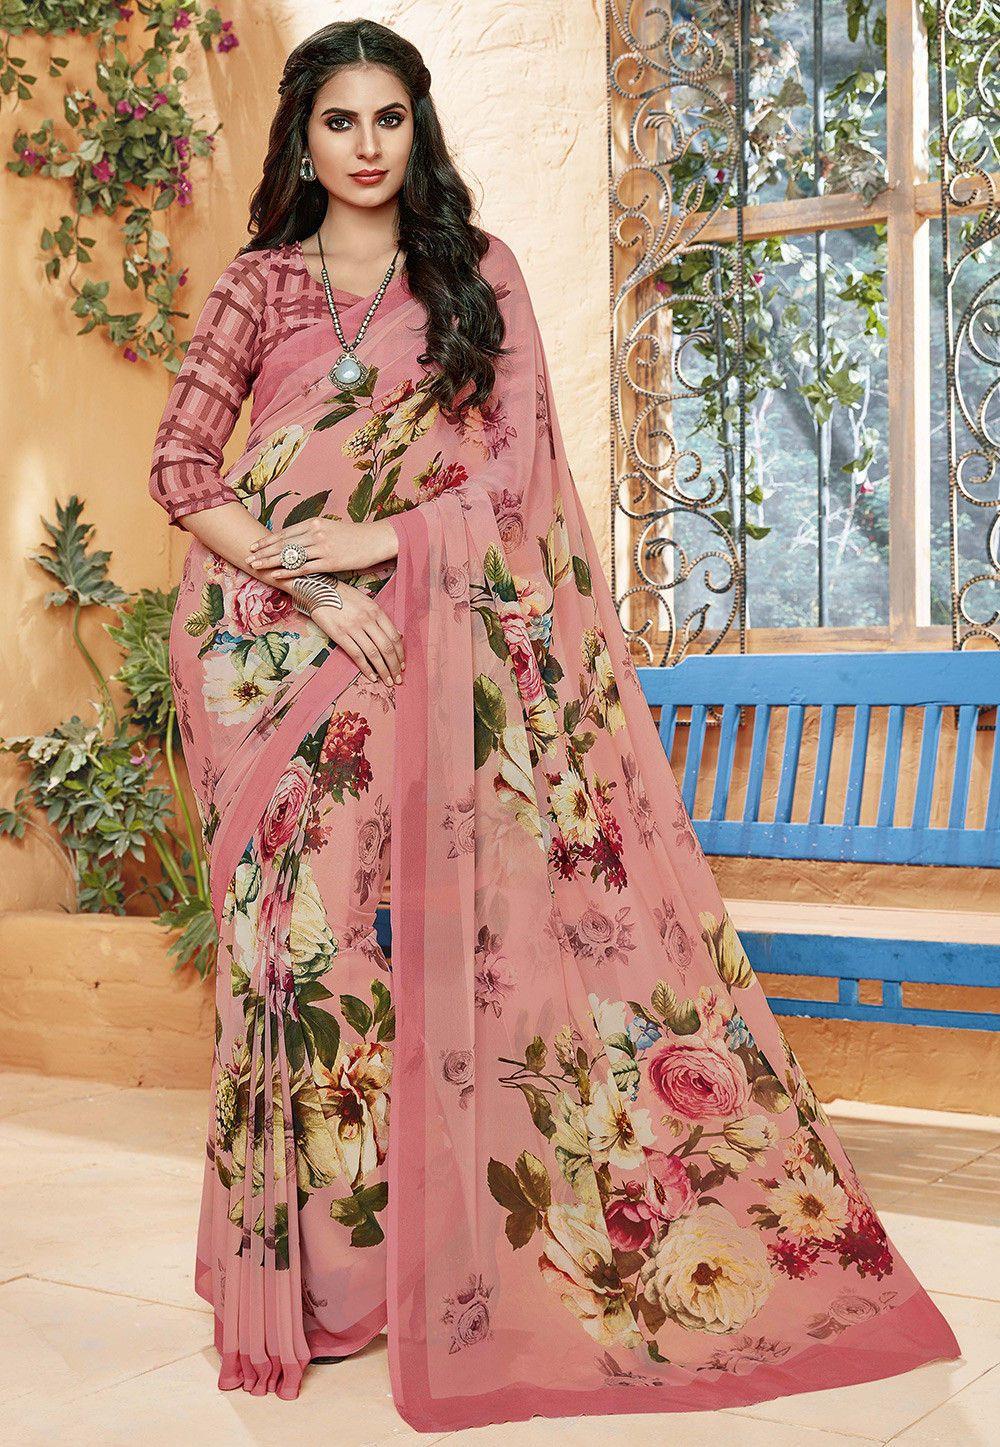 Buy Floral Printed Georgette Saree In Old Rose Online Item Code Sew4483 Color Pink Occasion Casu Designer Saree Blouse Patterns Floral Print Sarees Saree